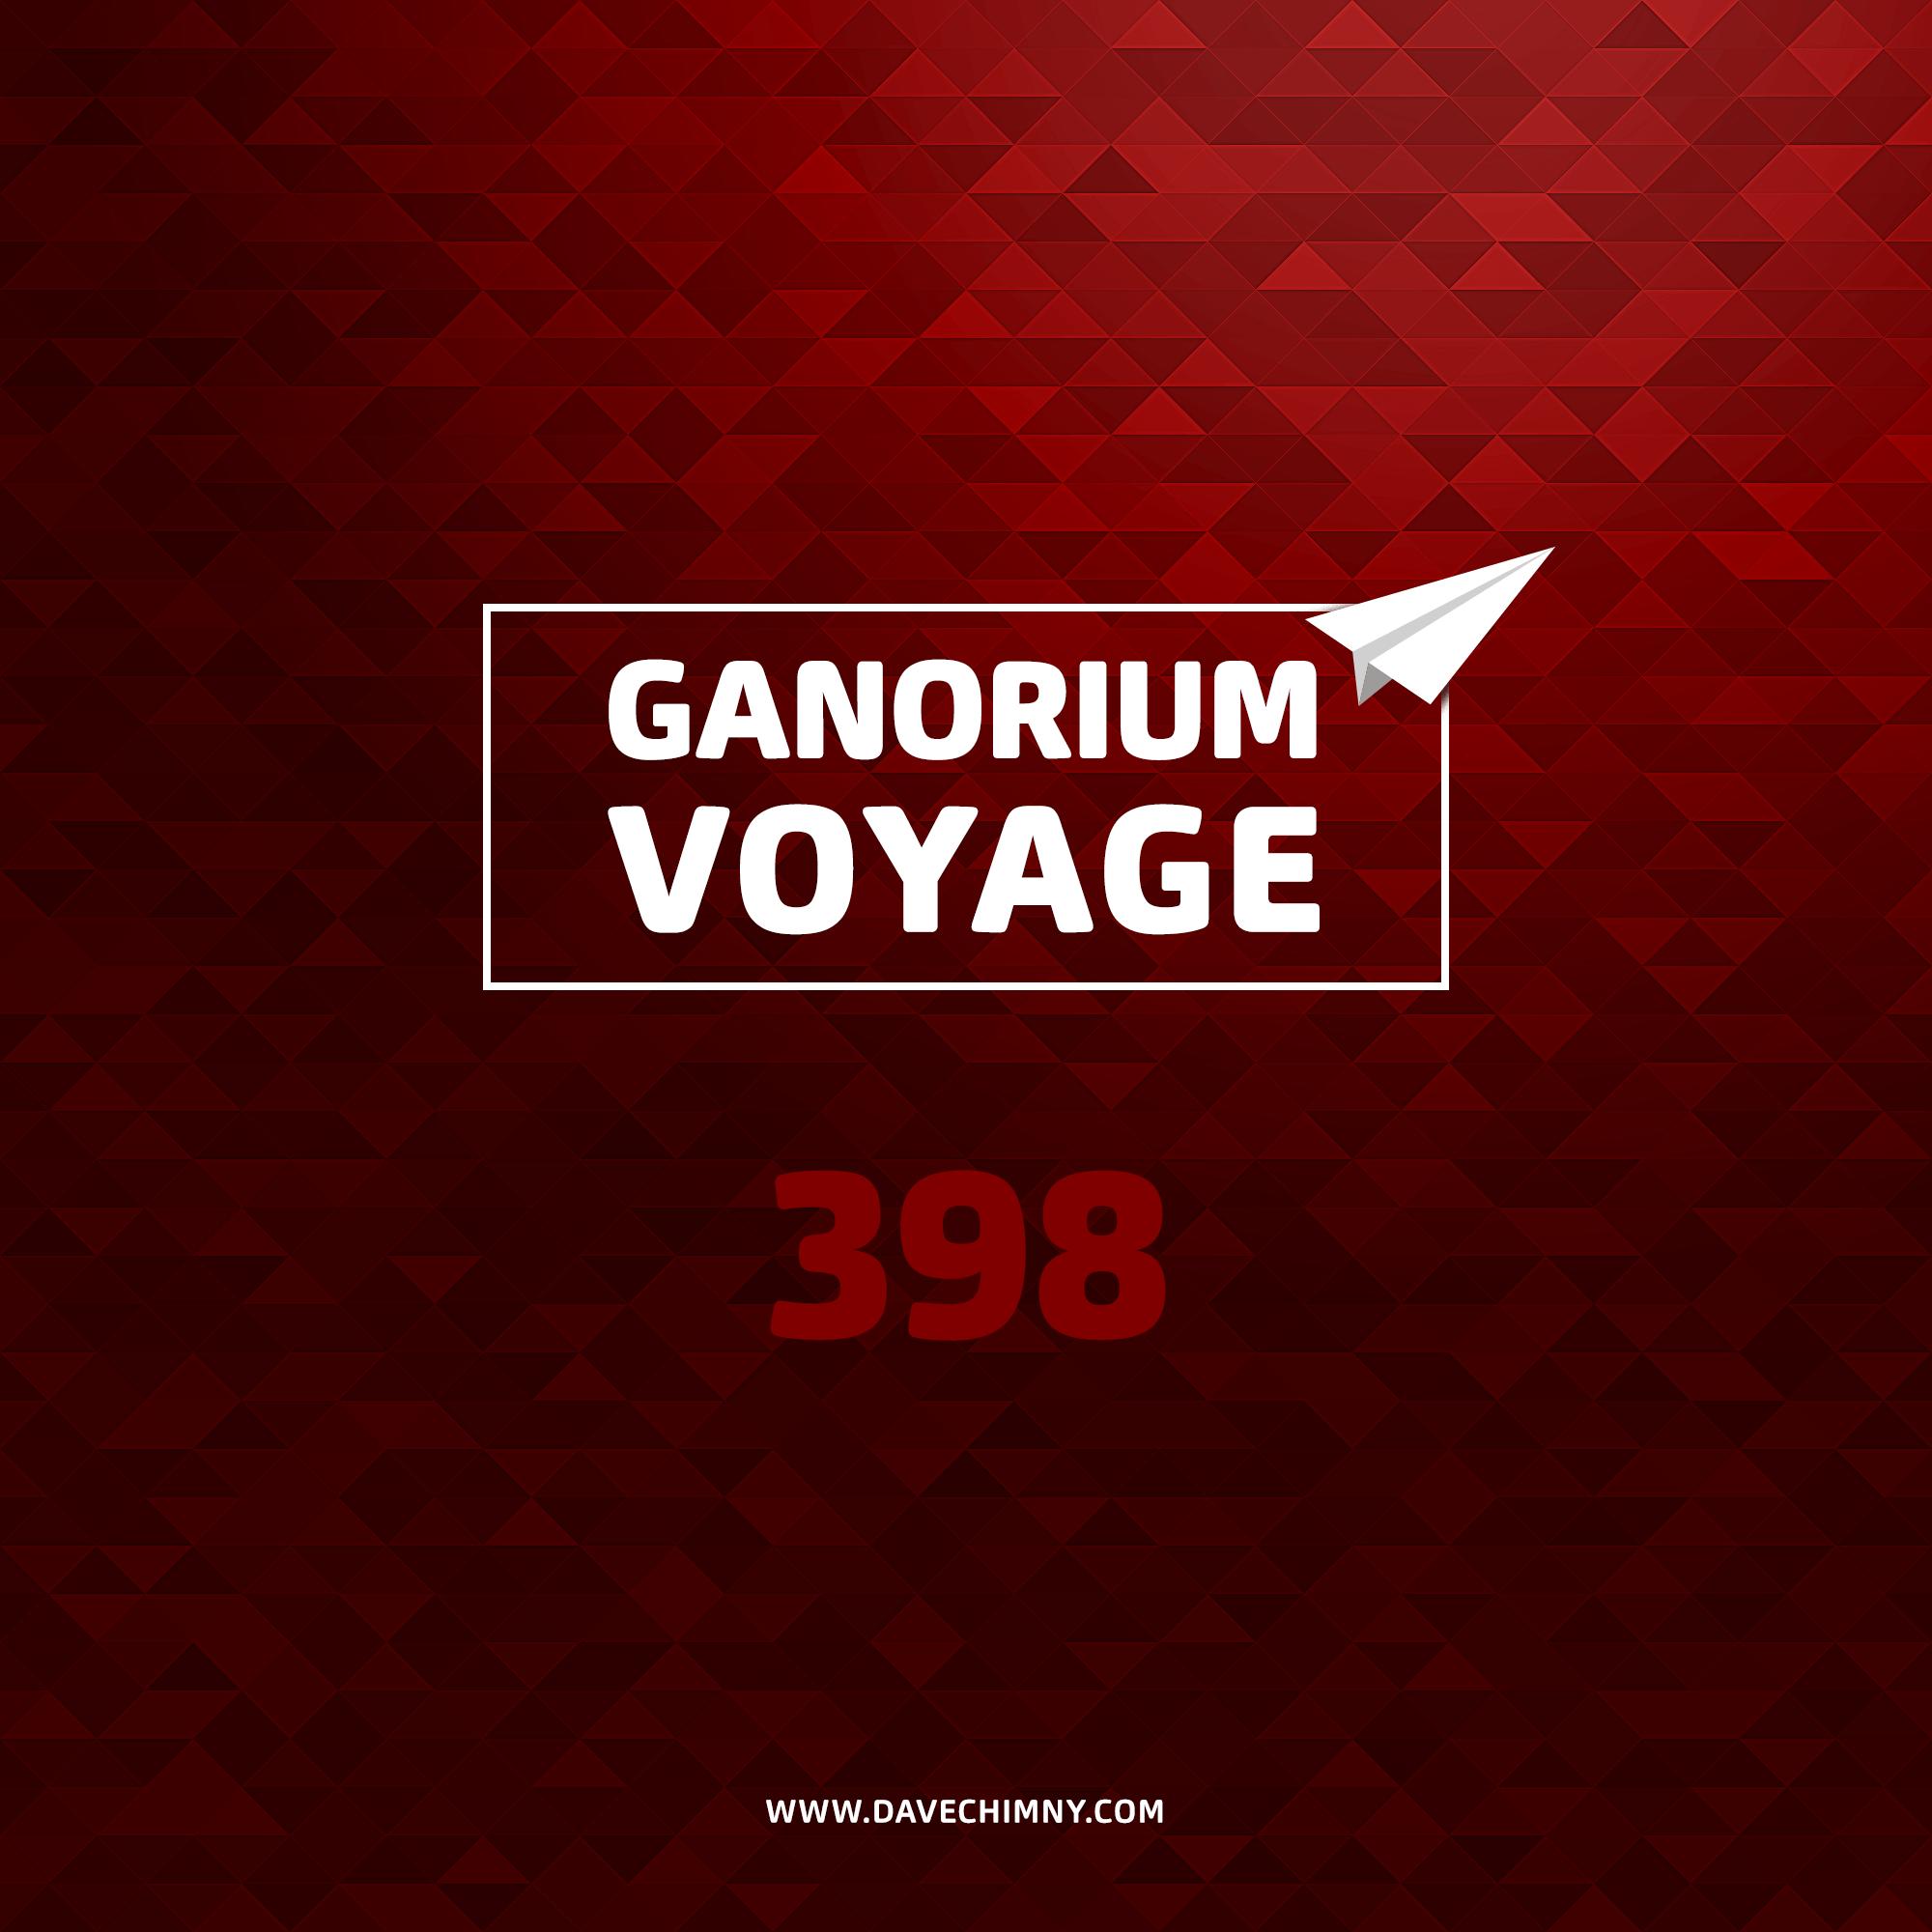 Dave Chimny - Ganorium Voyage 398